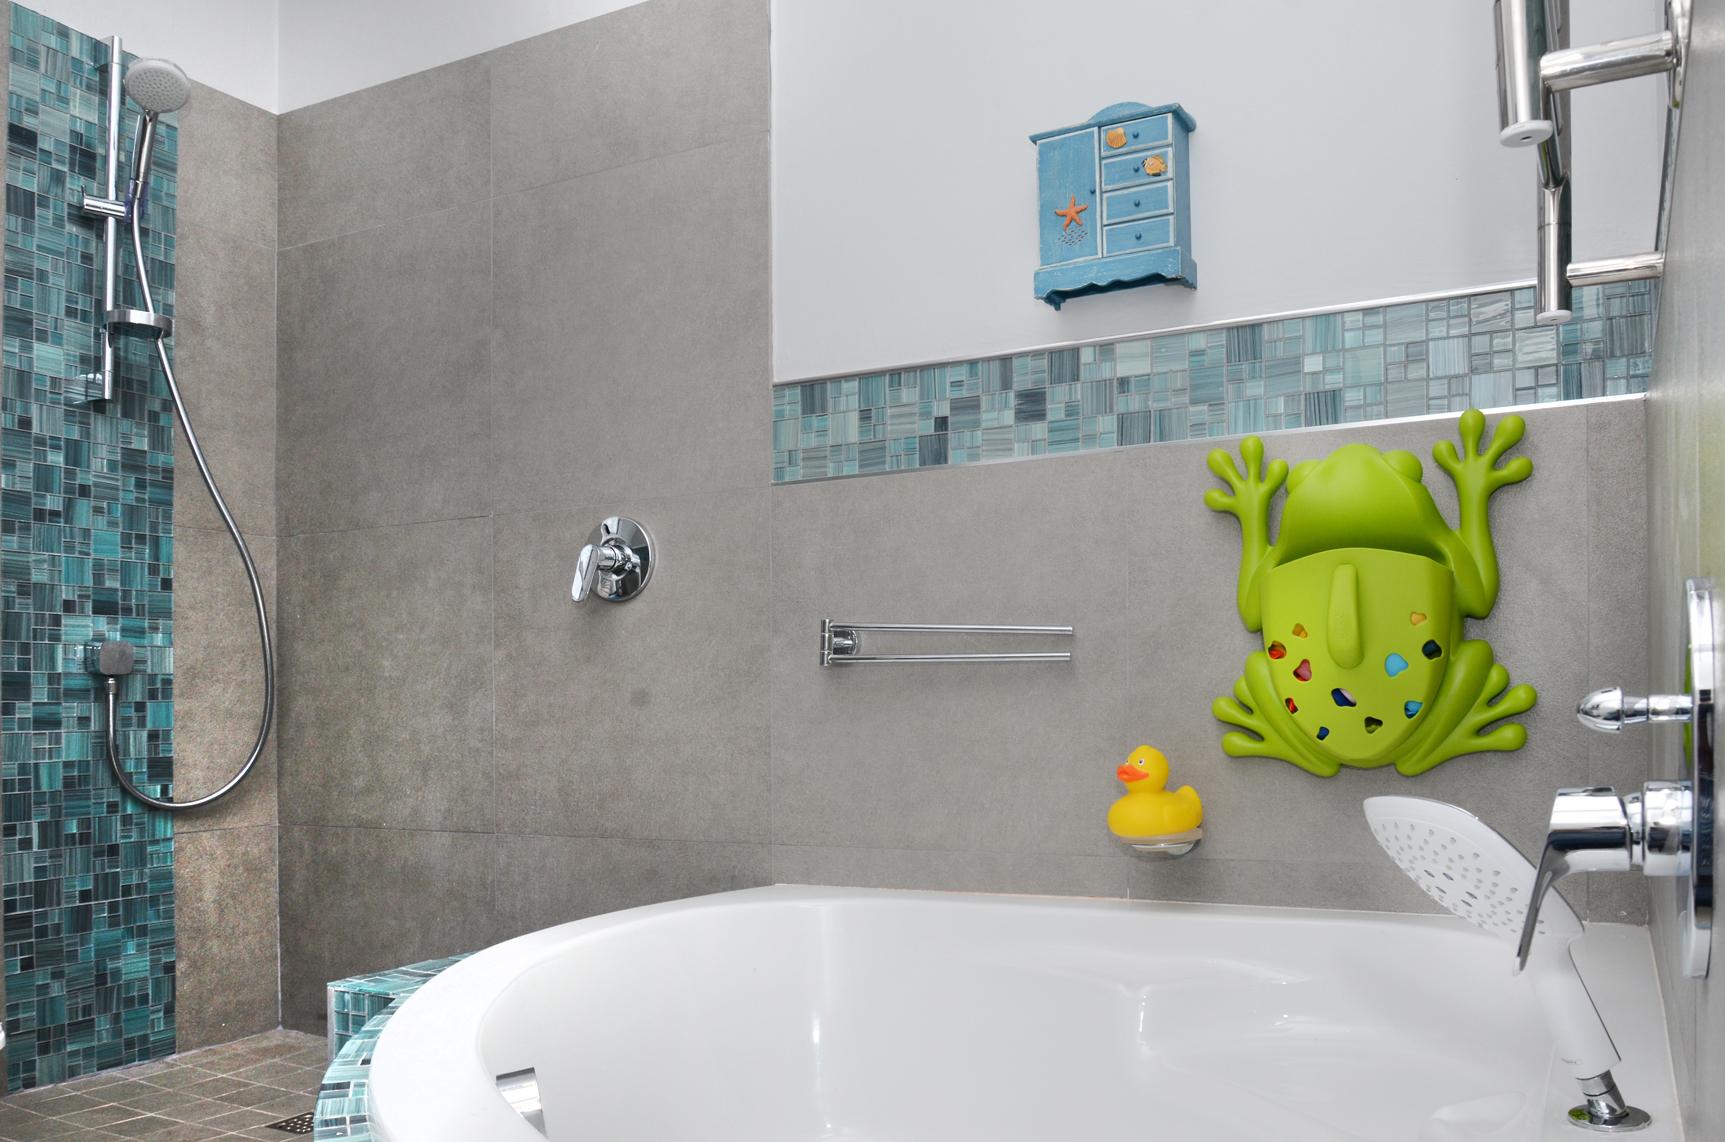 ... Childrens Bathroom With Corner Bath, Rim Mounted Hand Shower ...